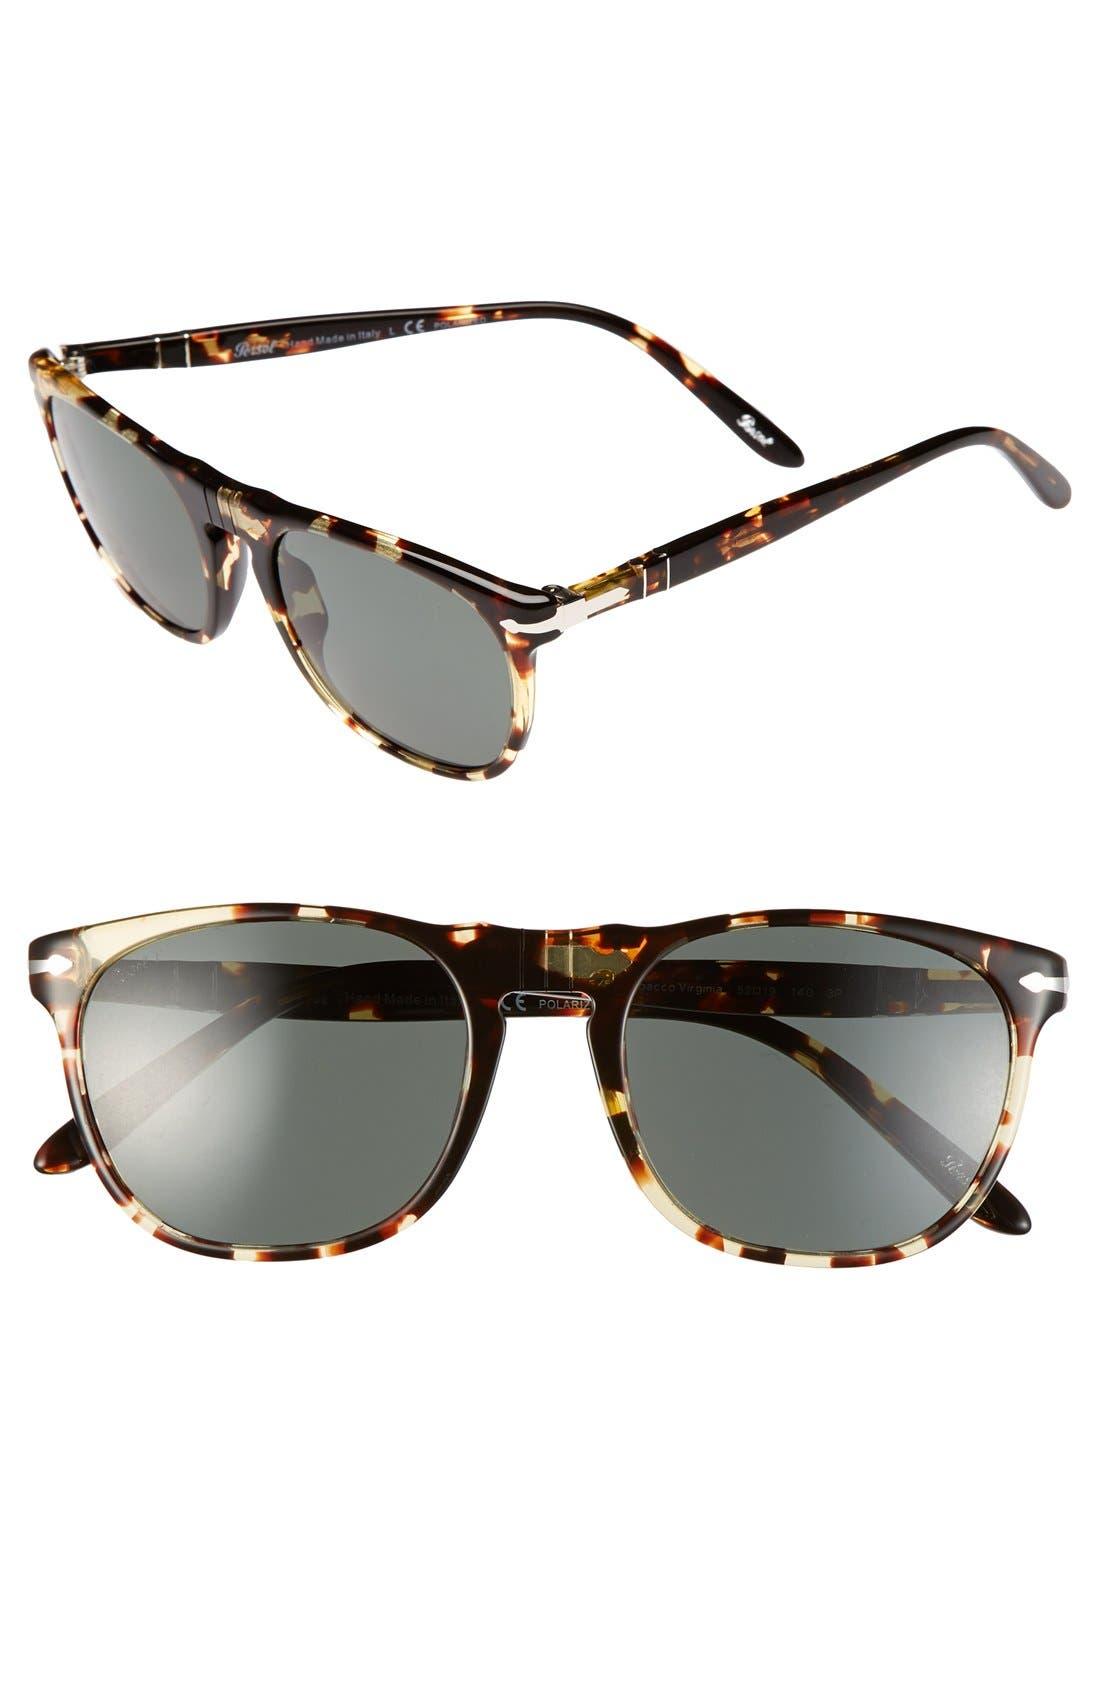 Alternate Image 1 Selected - Persol 52mm Retro Keyhole Sunglasses